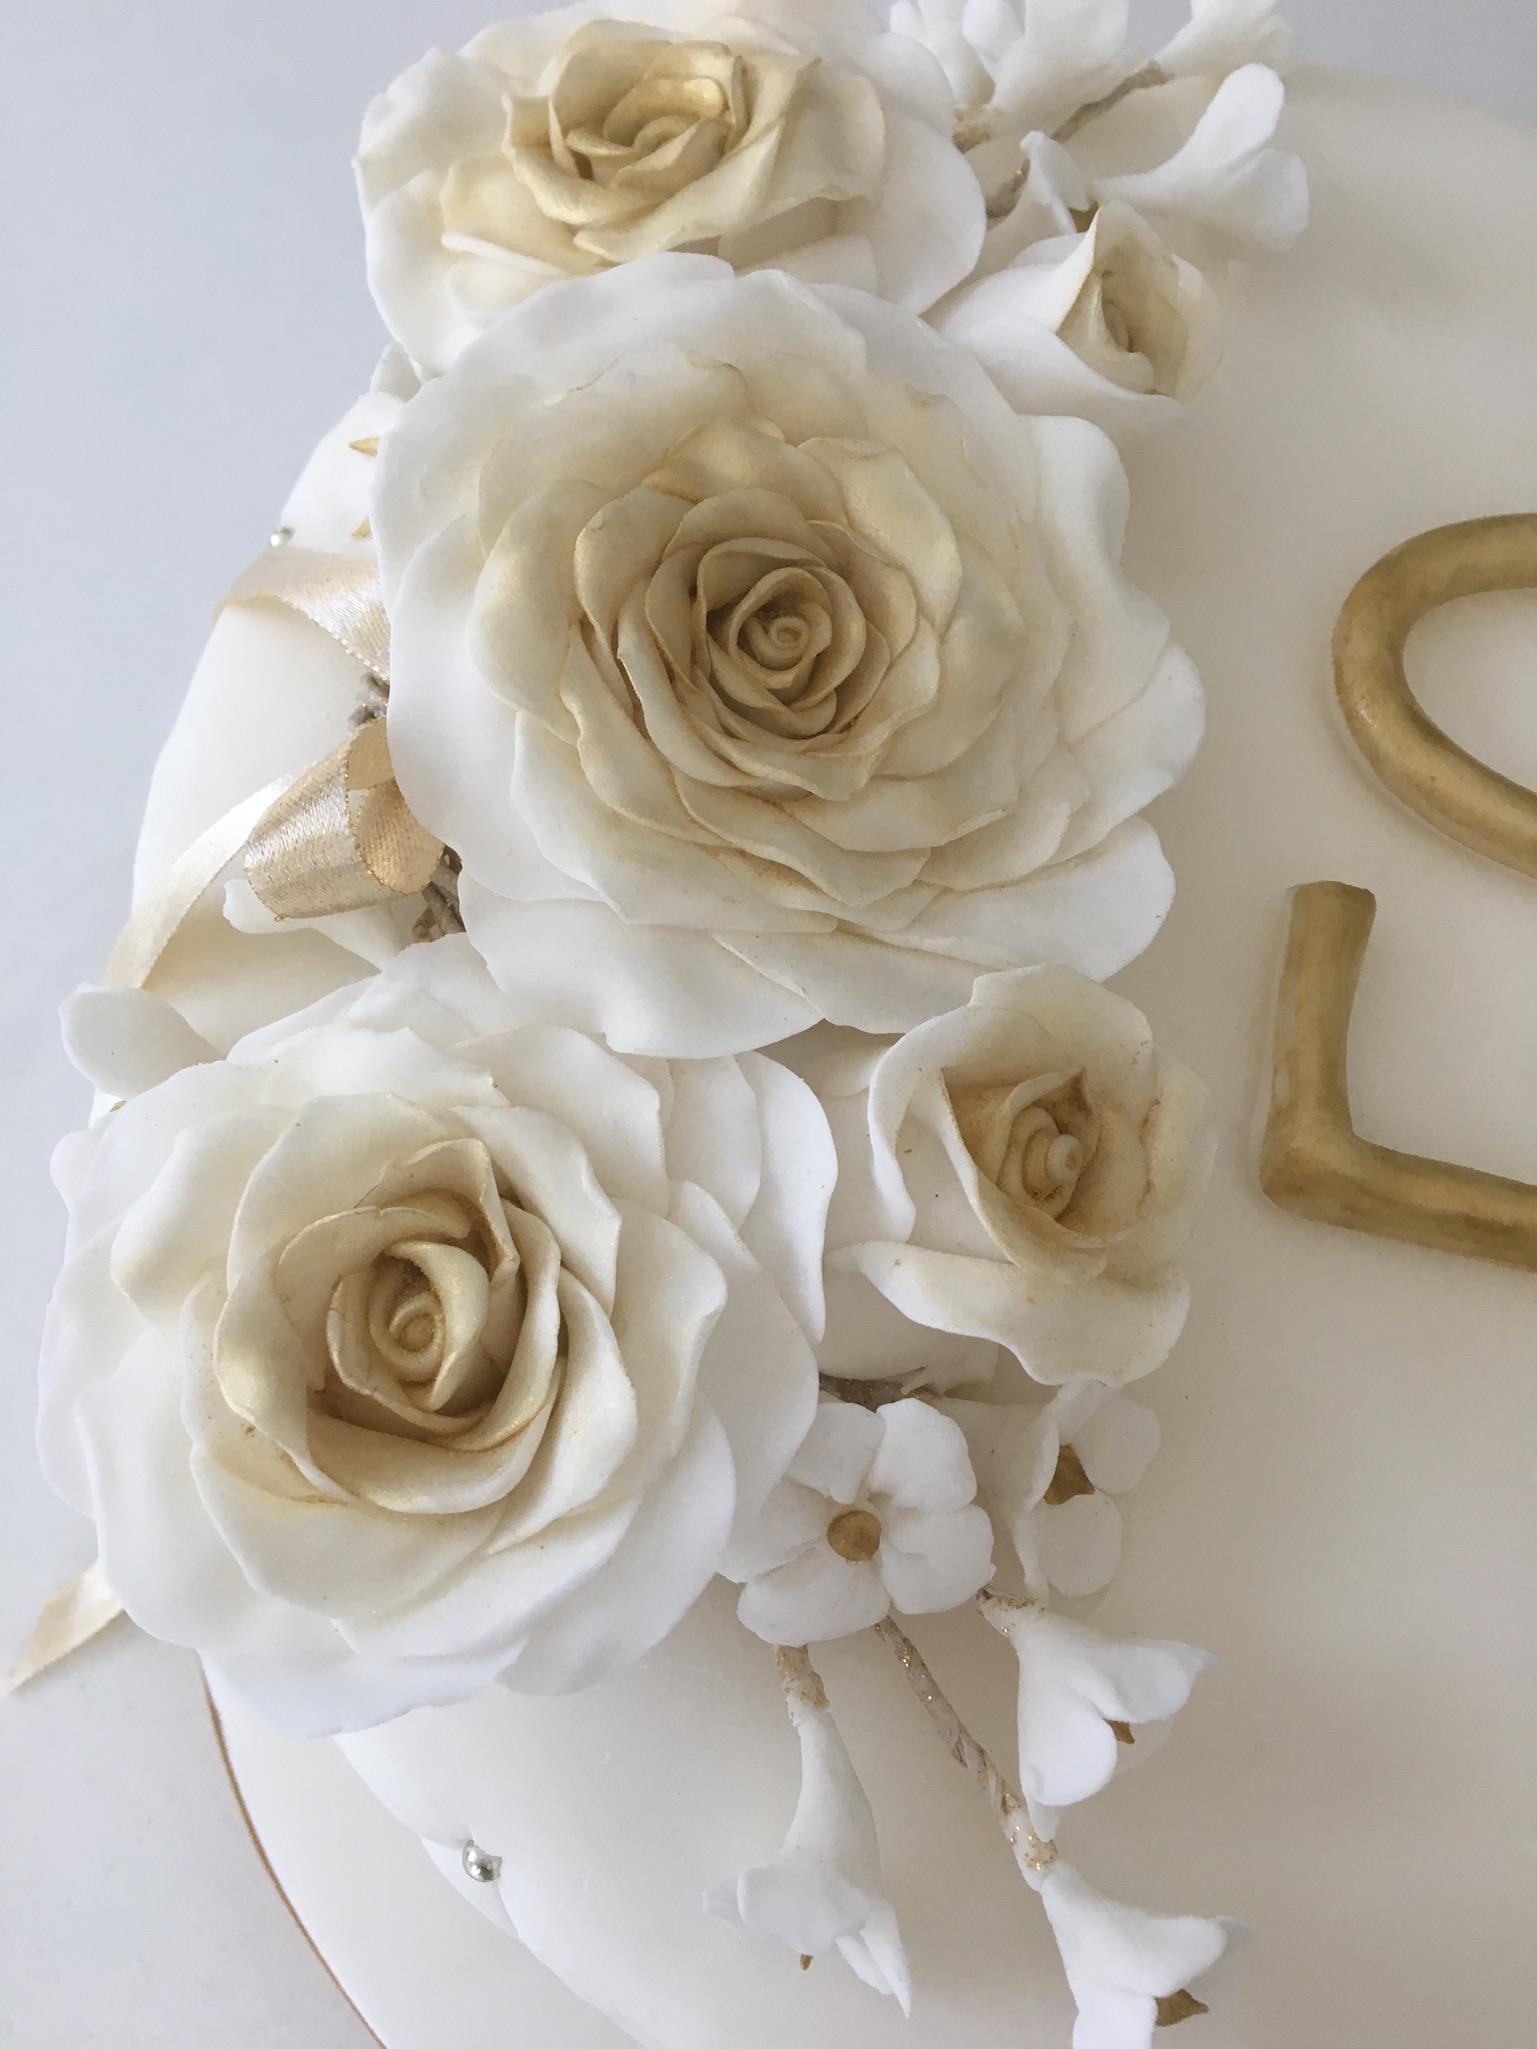 Elegant gold floral wedding anniversary cake